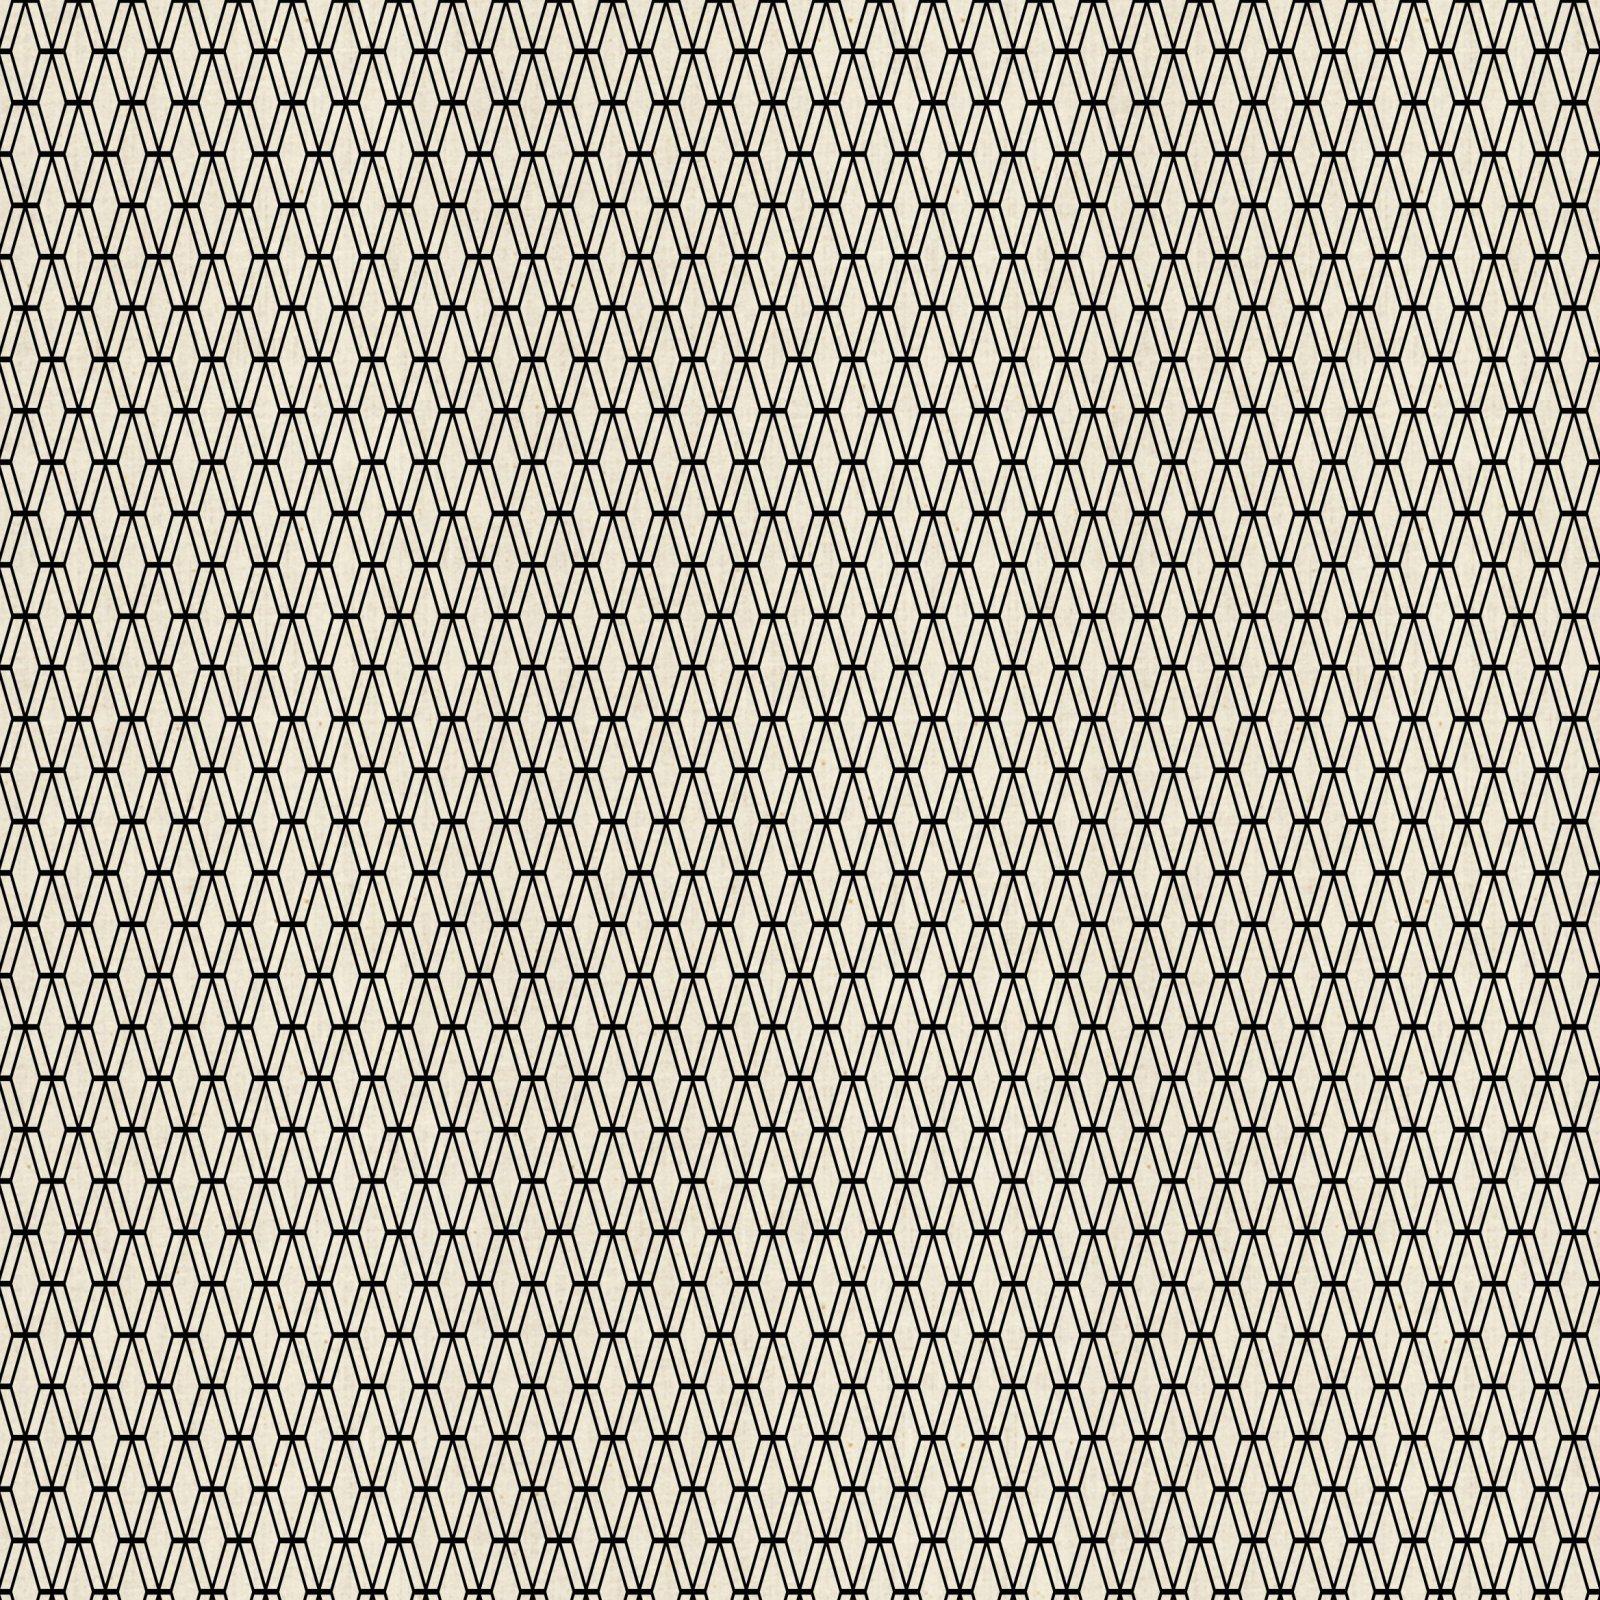 Cotton and Steel Basics Mishmesh CS102-FI1U Fishnet Stockings Unbleached Fabric